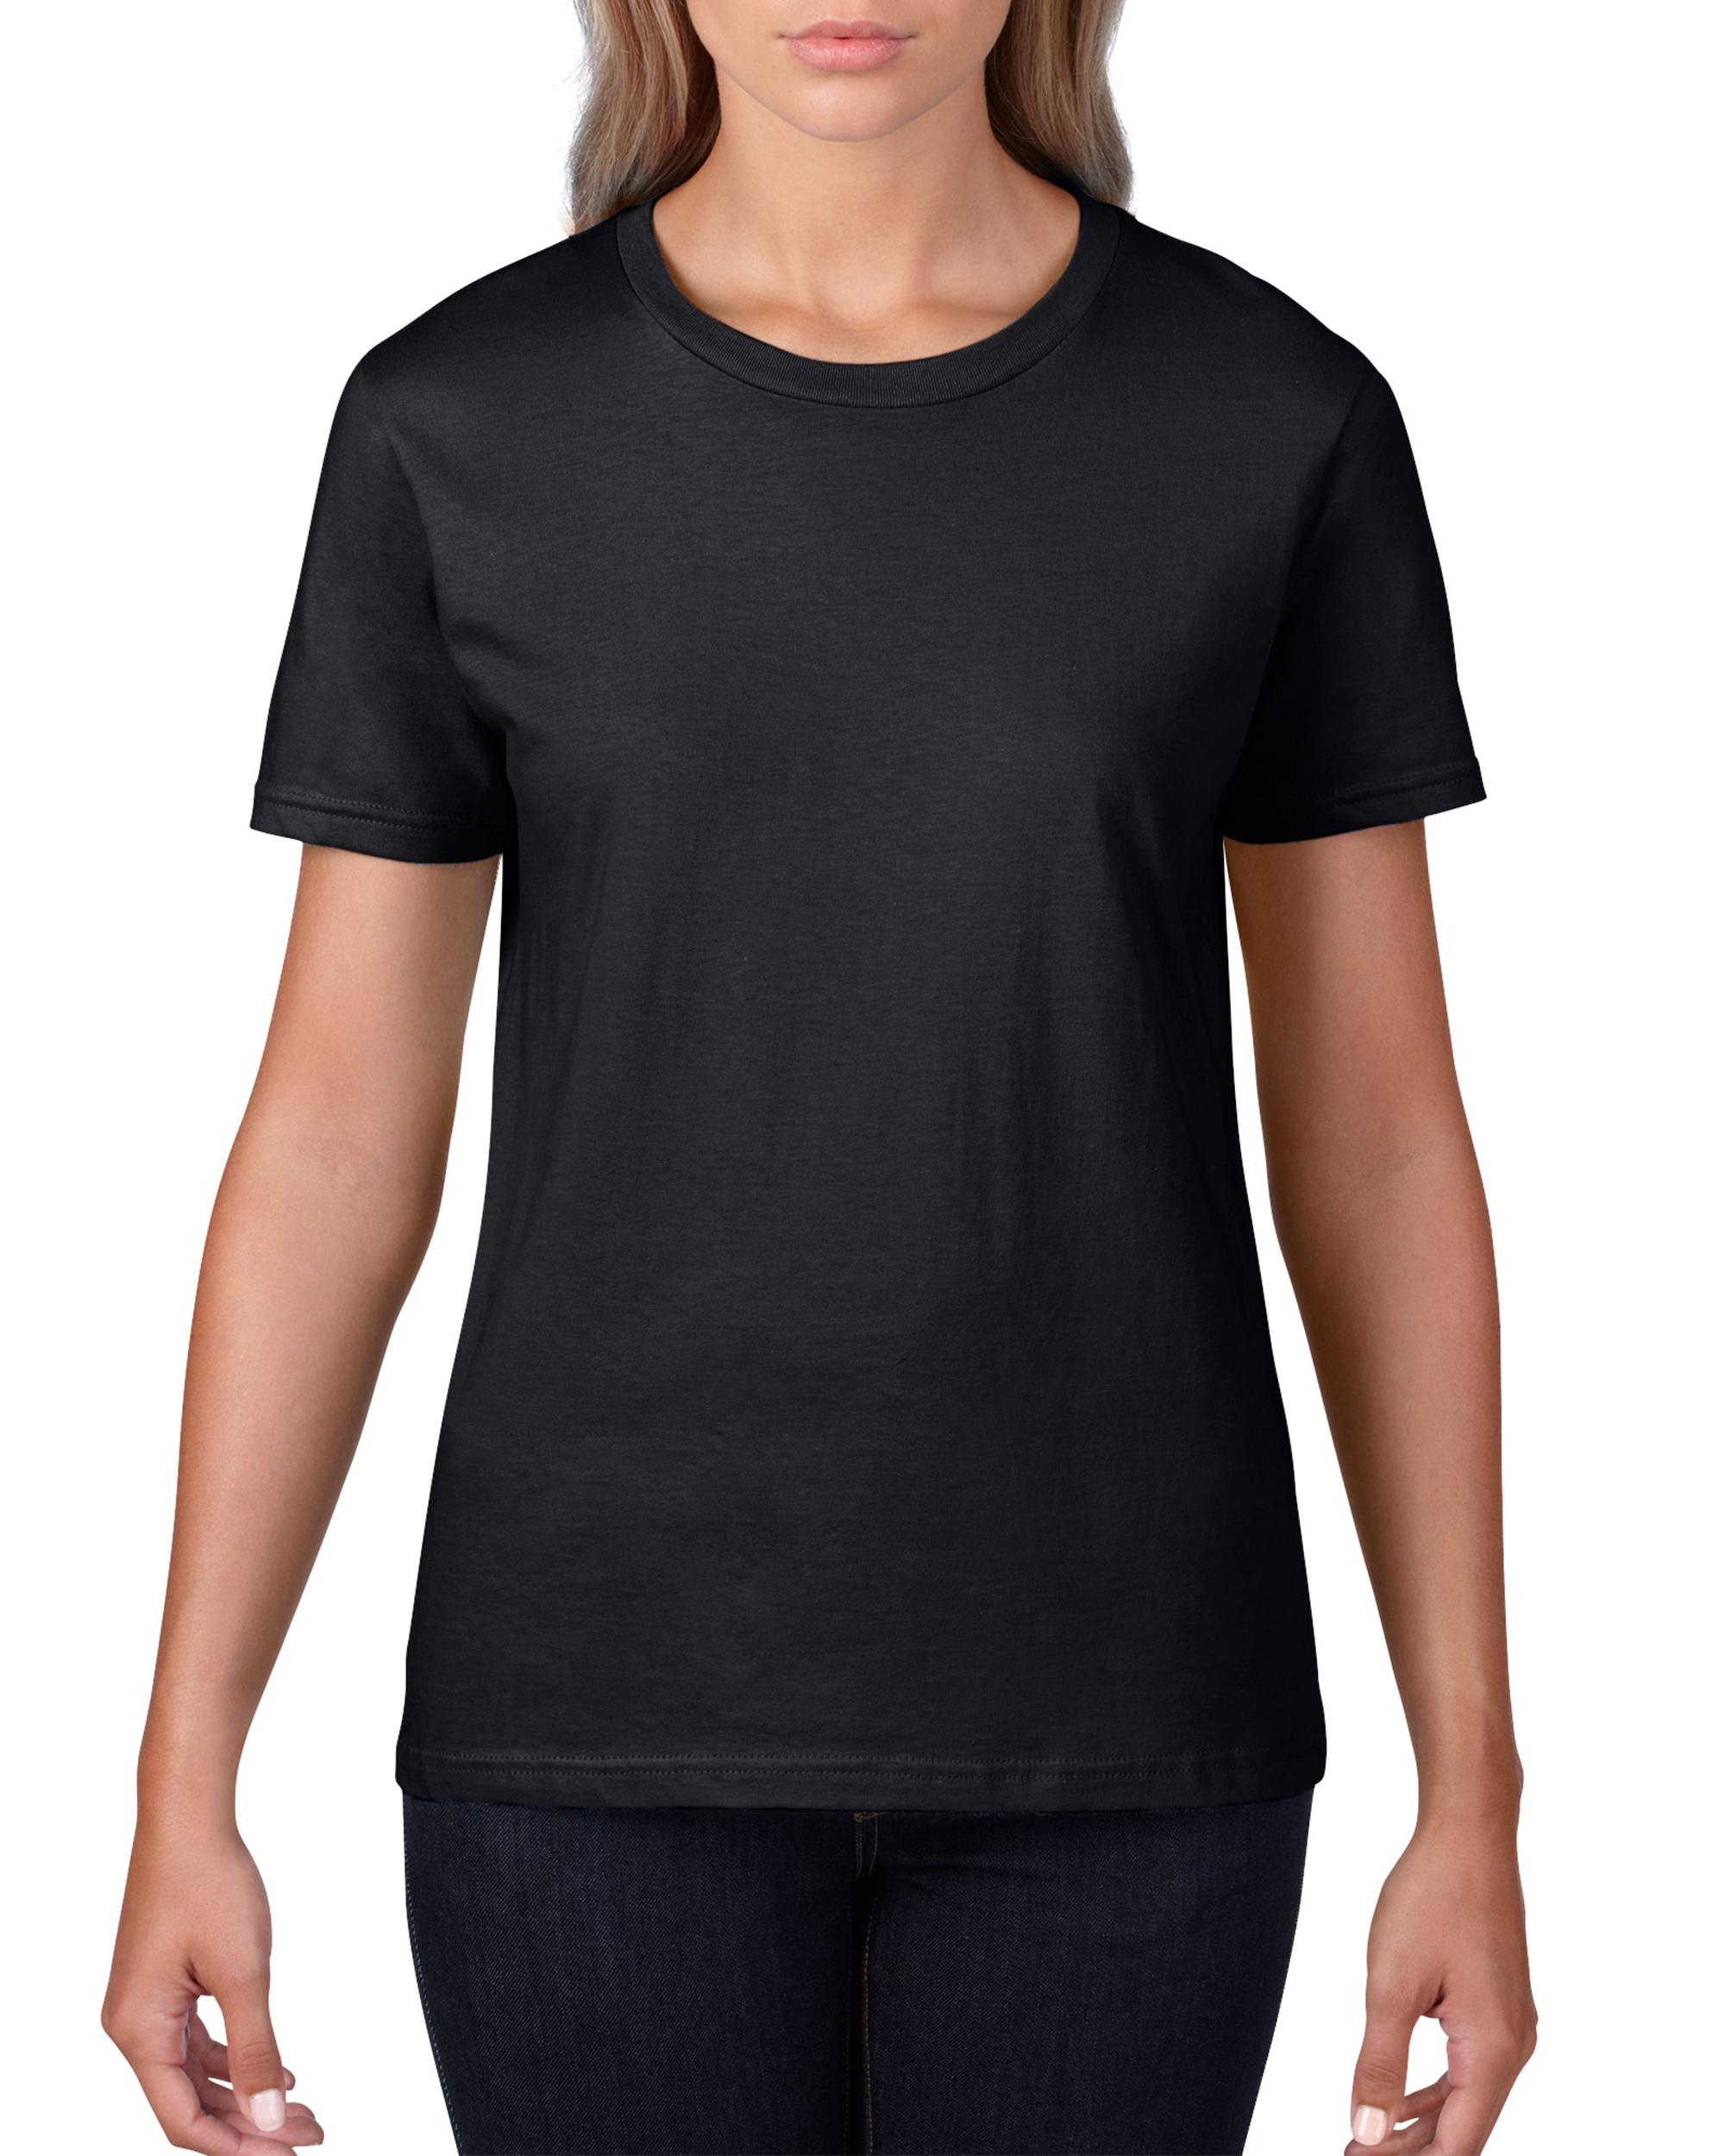 Gildan T-shirt Premium Cotton for her